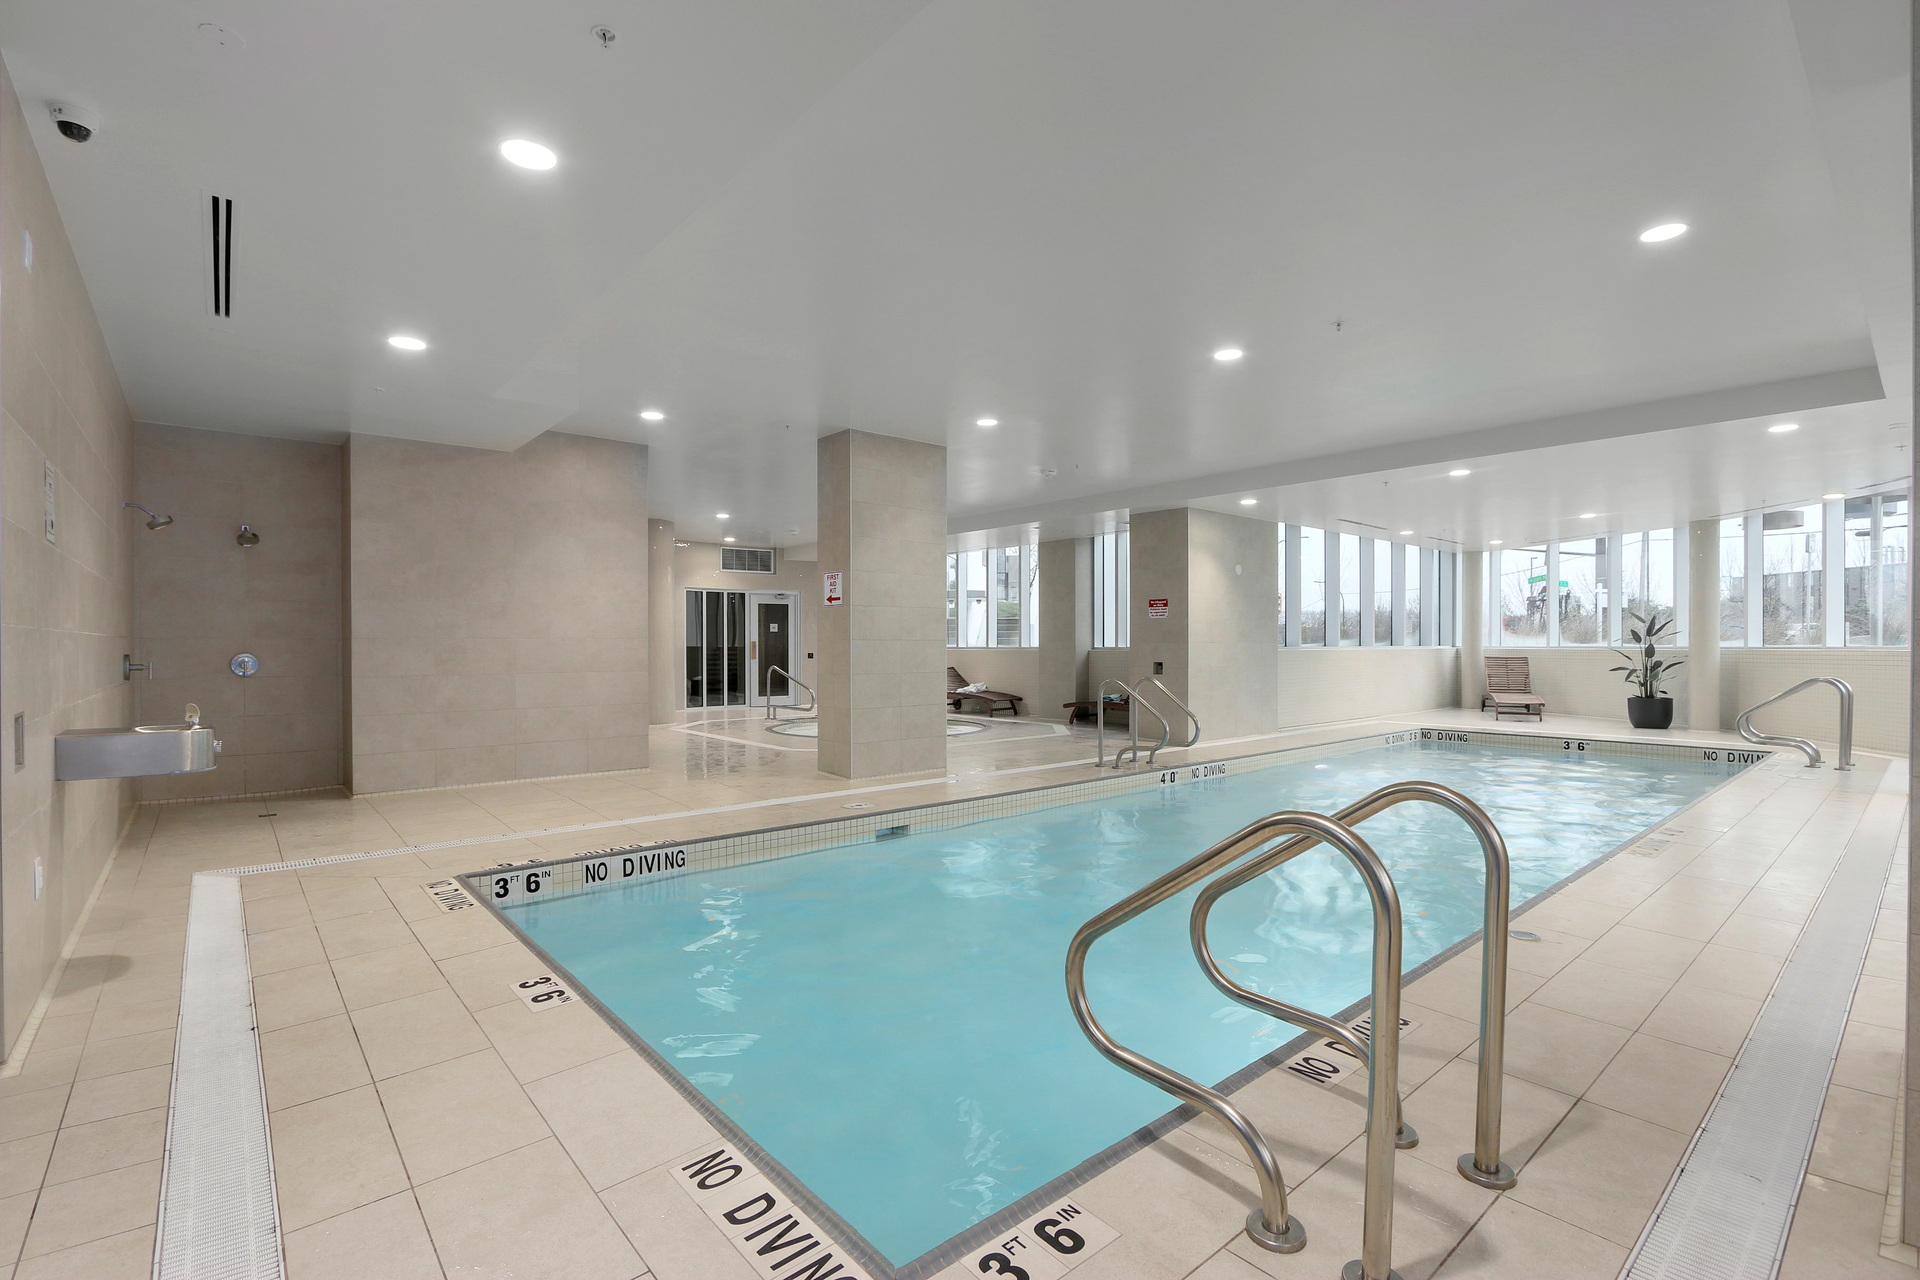 Indoor pool at 3610 - 1788 Gilmore Avenue, Willingdon Heights, Burnaby North